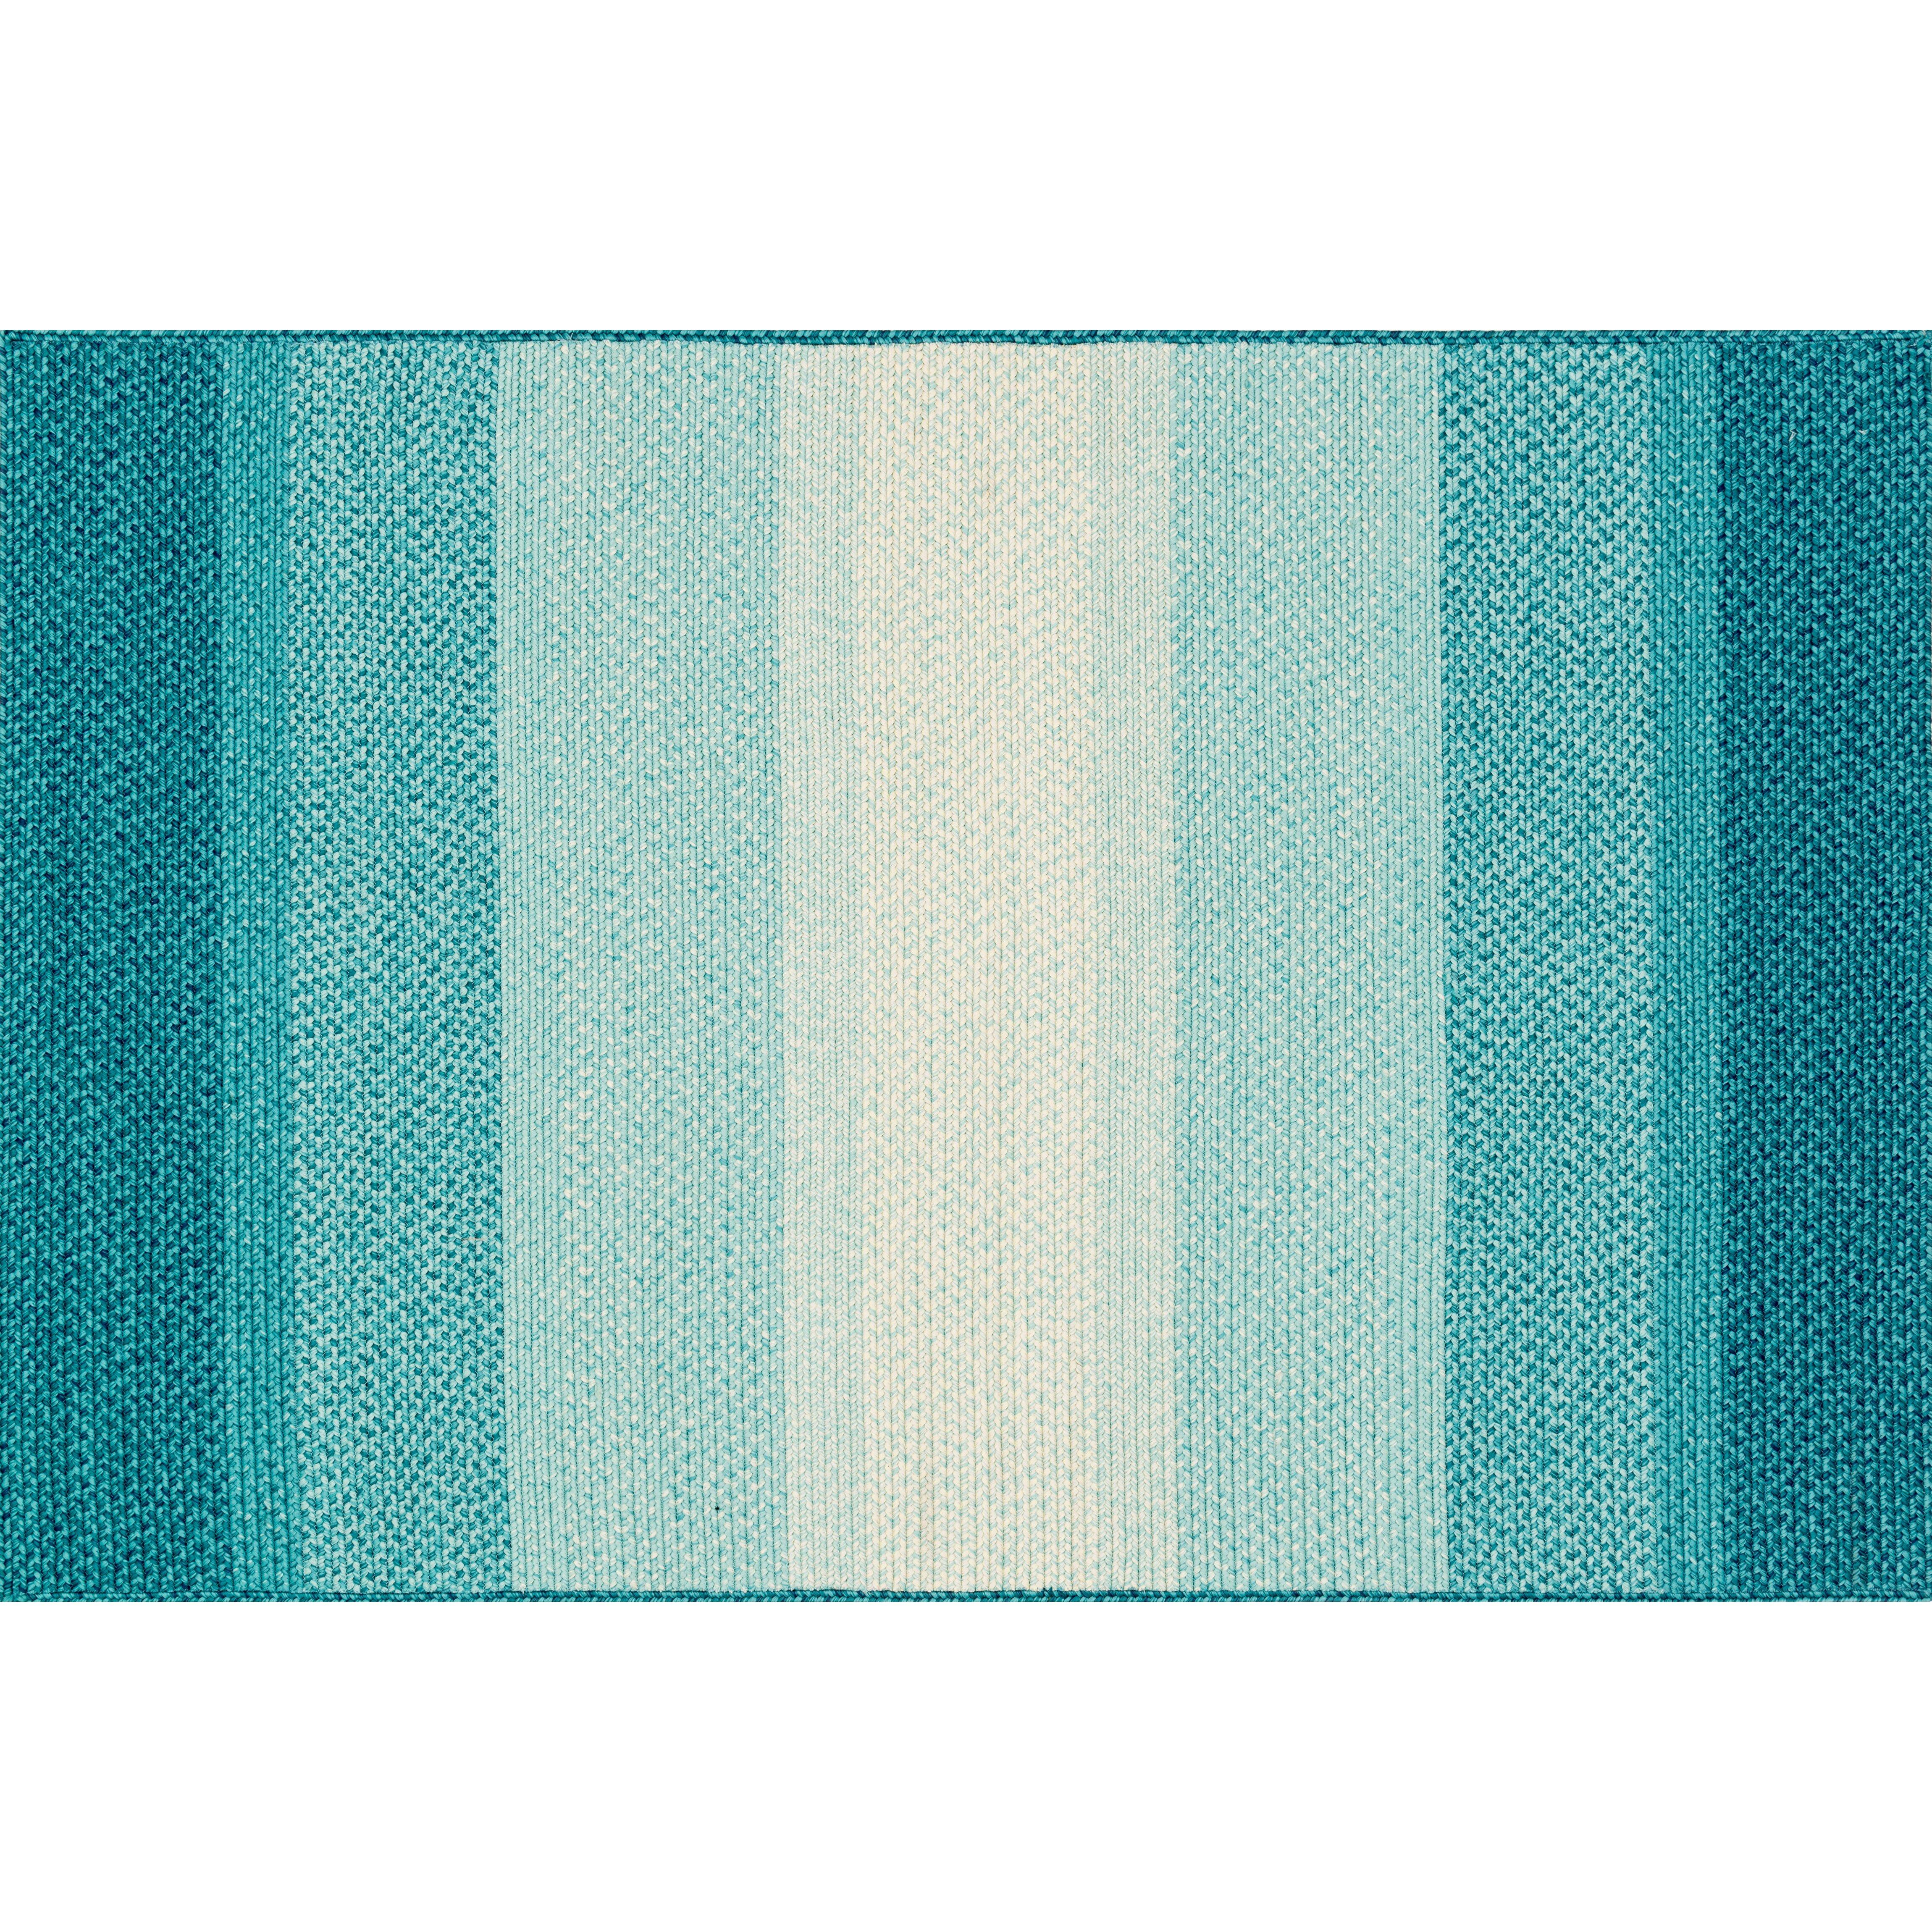 Loloi rugs garrett blue indoor outdoor area rug reviews for Blue indoor outdoor rug